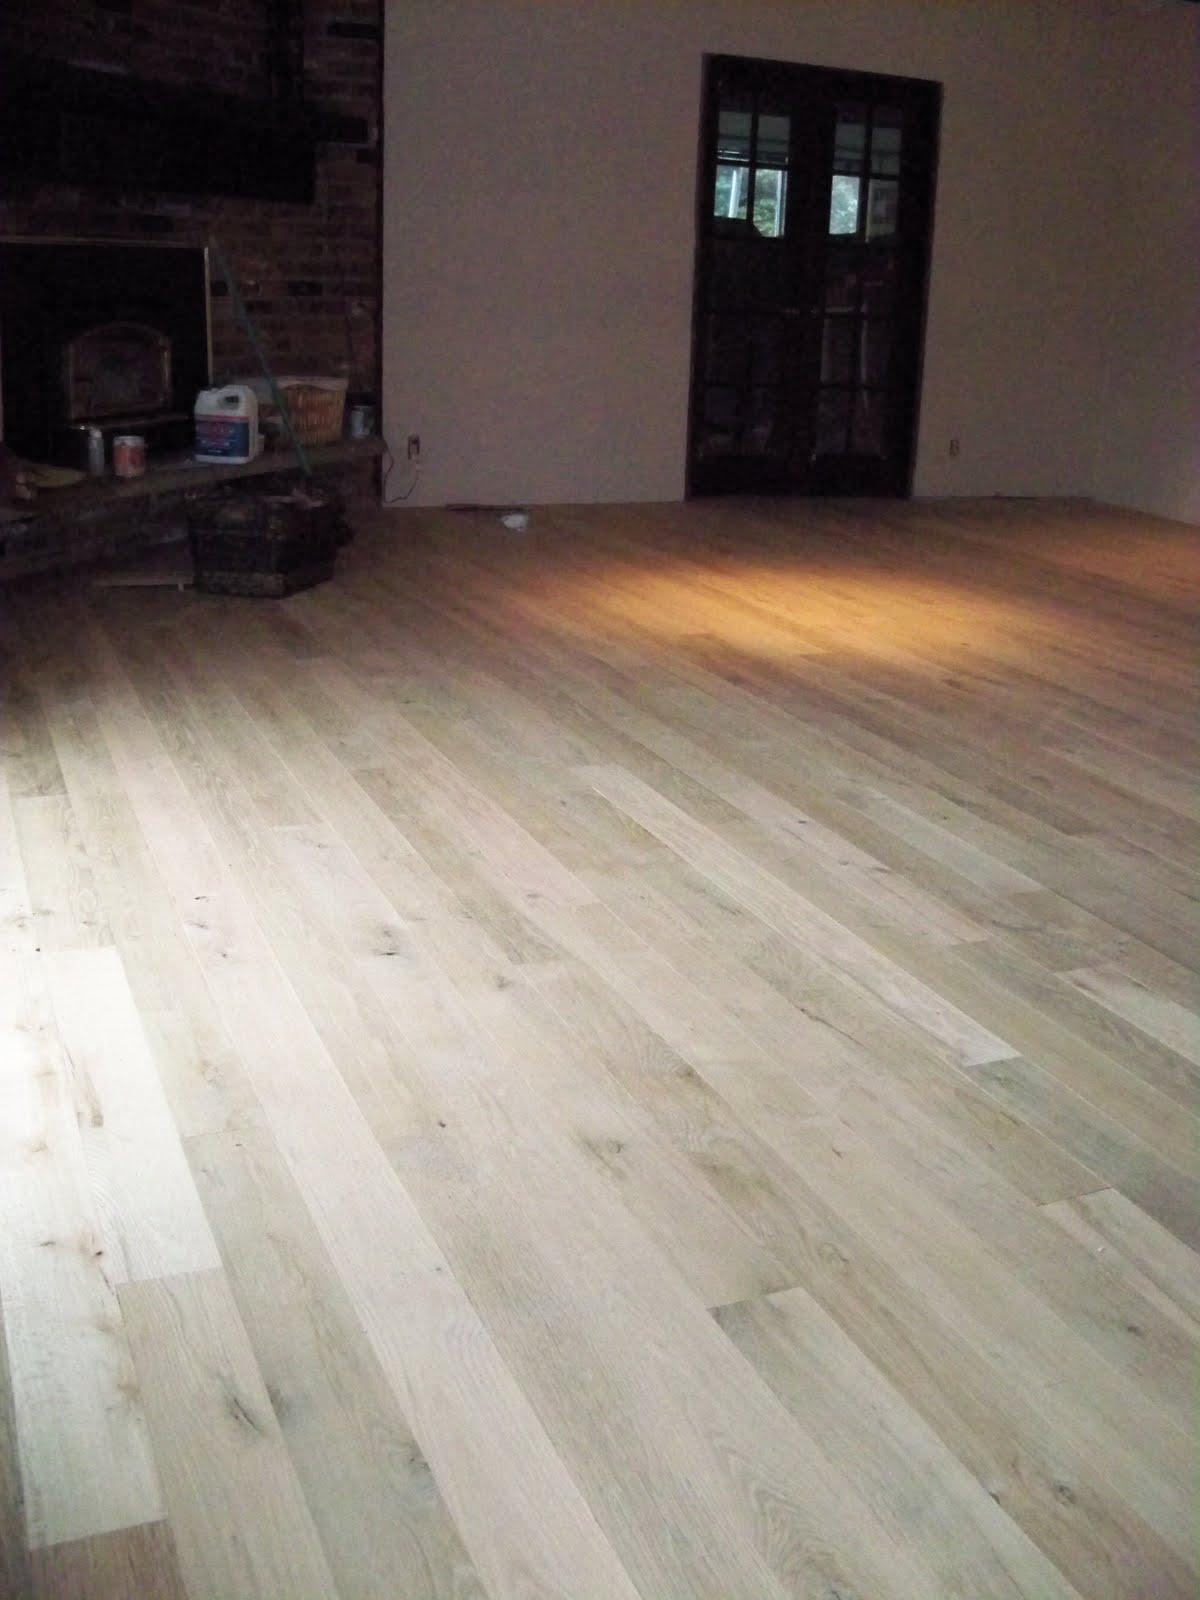 Sausman floor coverings seattle reclaimed hardwoods for Reclaimed fir flooring seattle